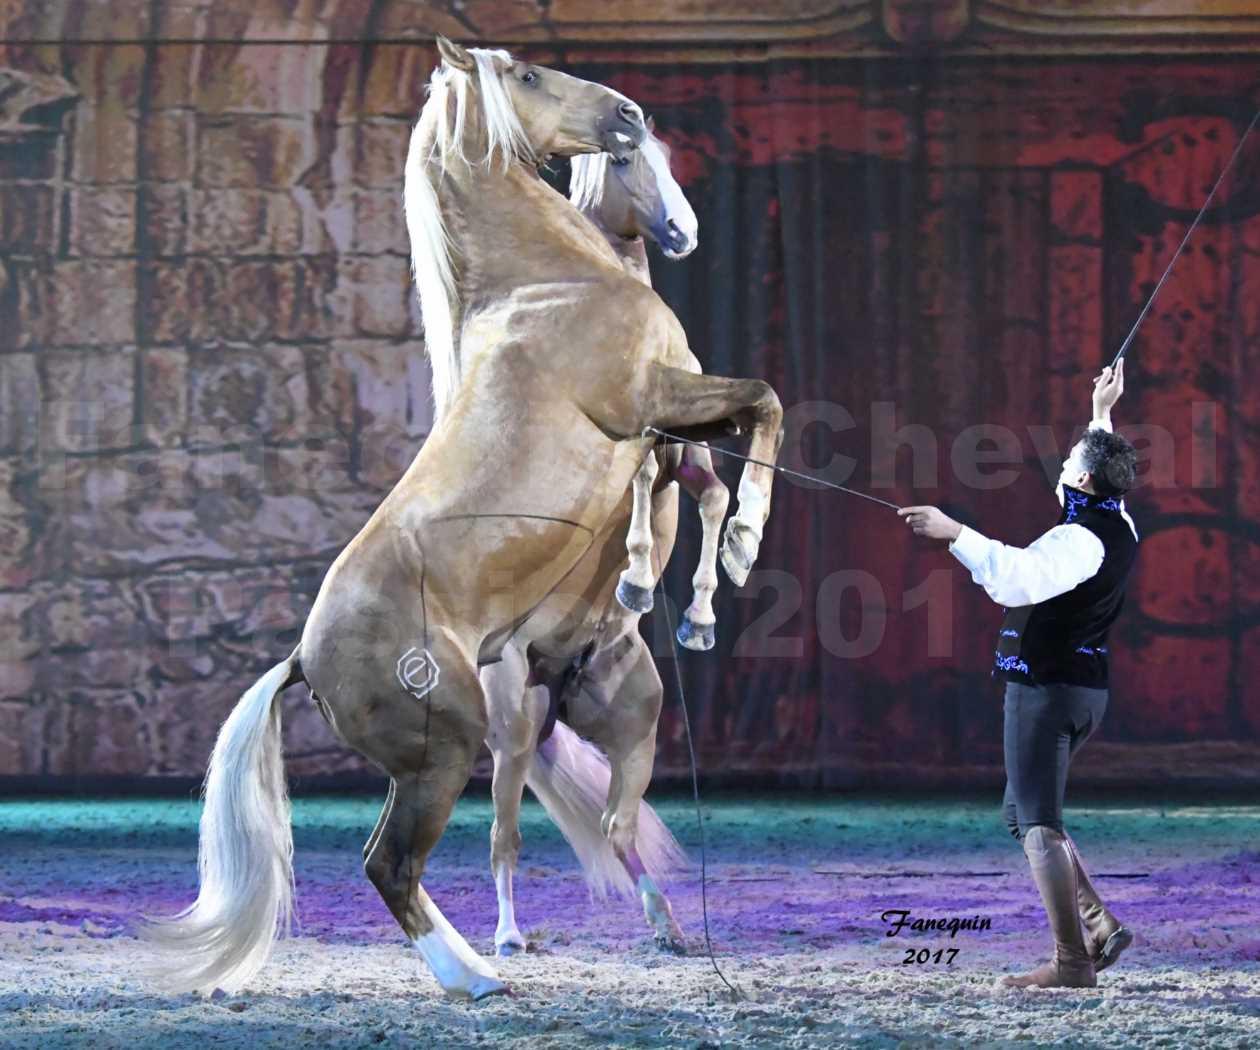 Cheval Passion 2017 - gala des Crinières d'OR - GARI ZOHER - 02